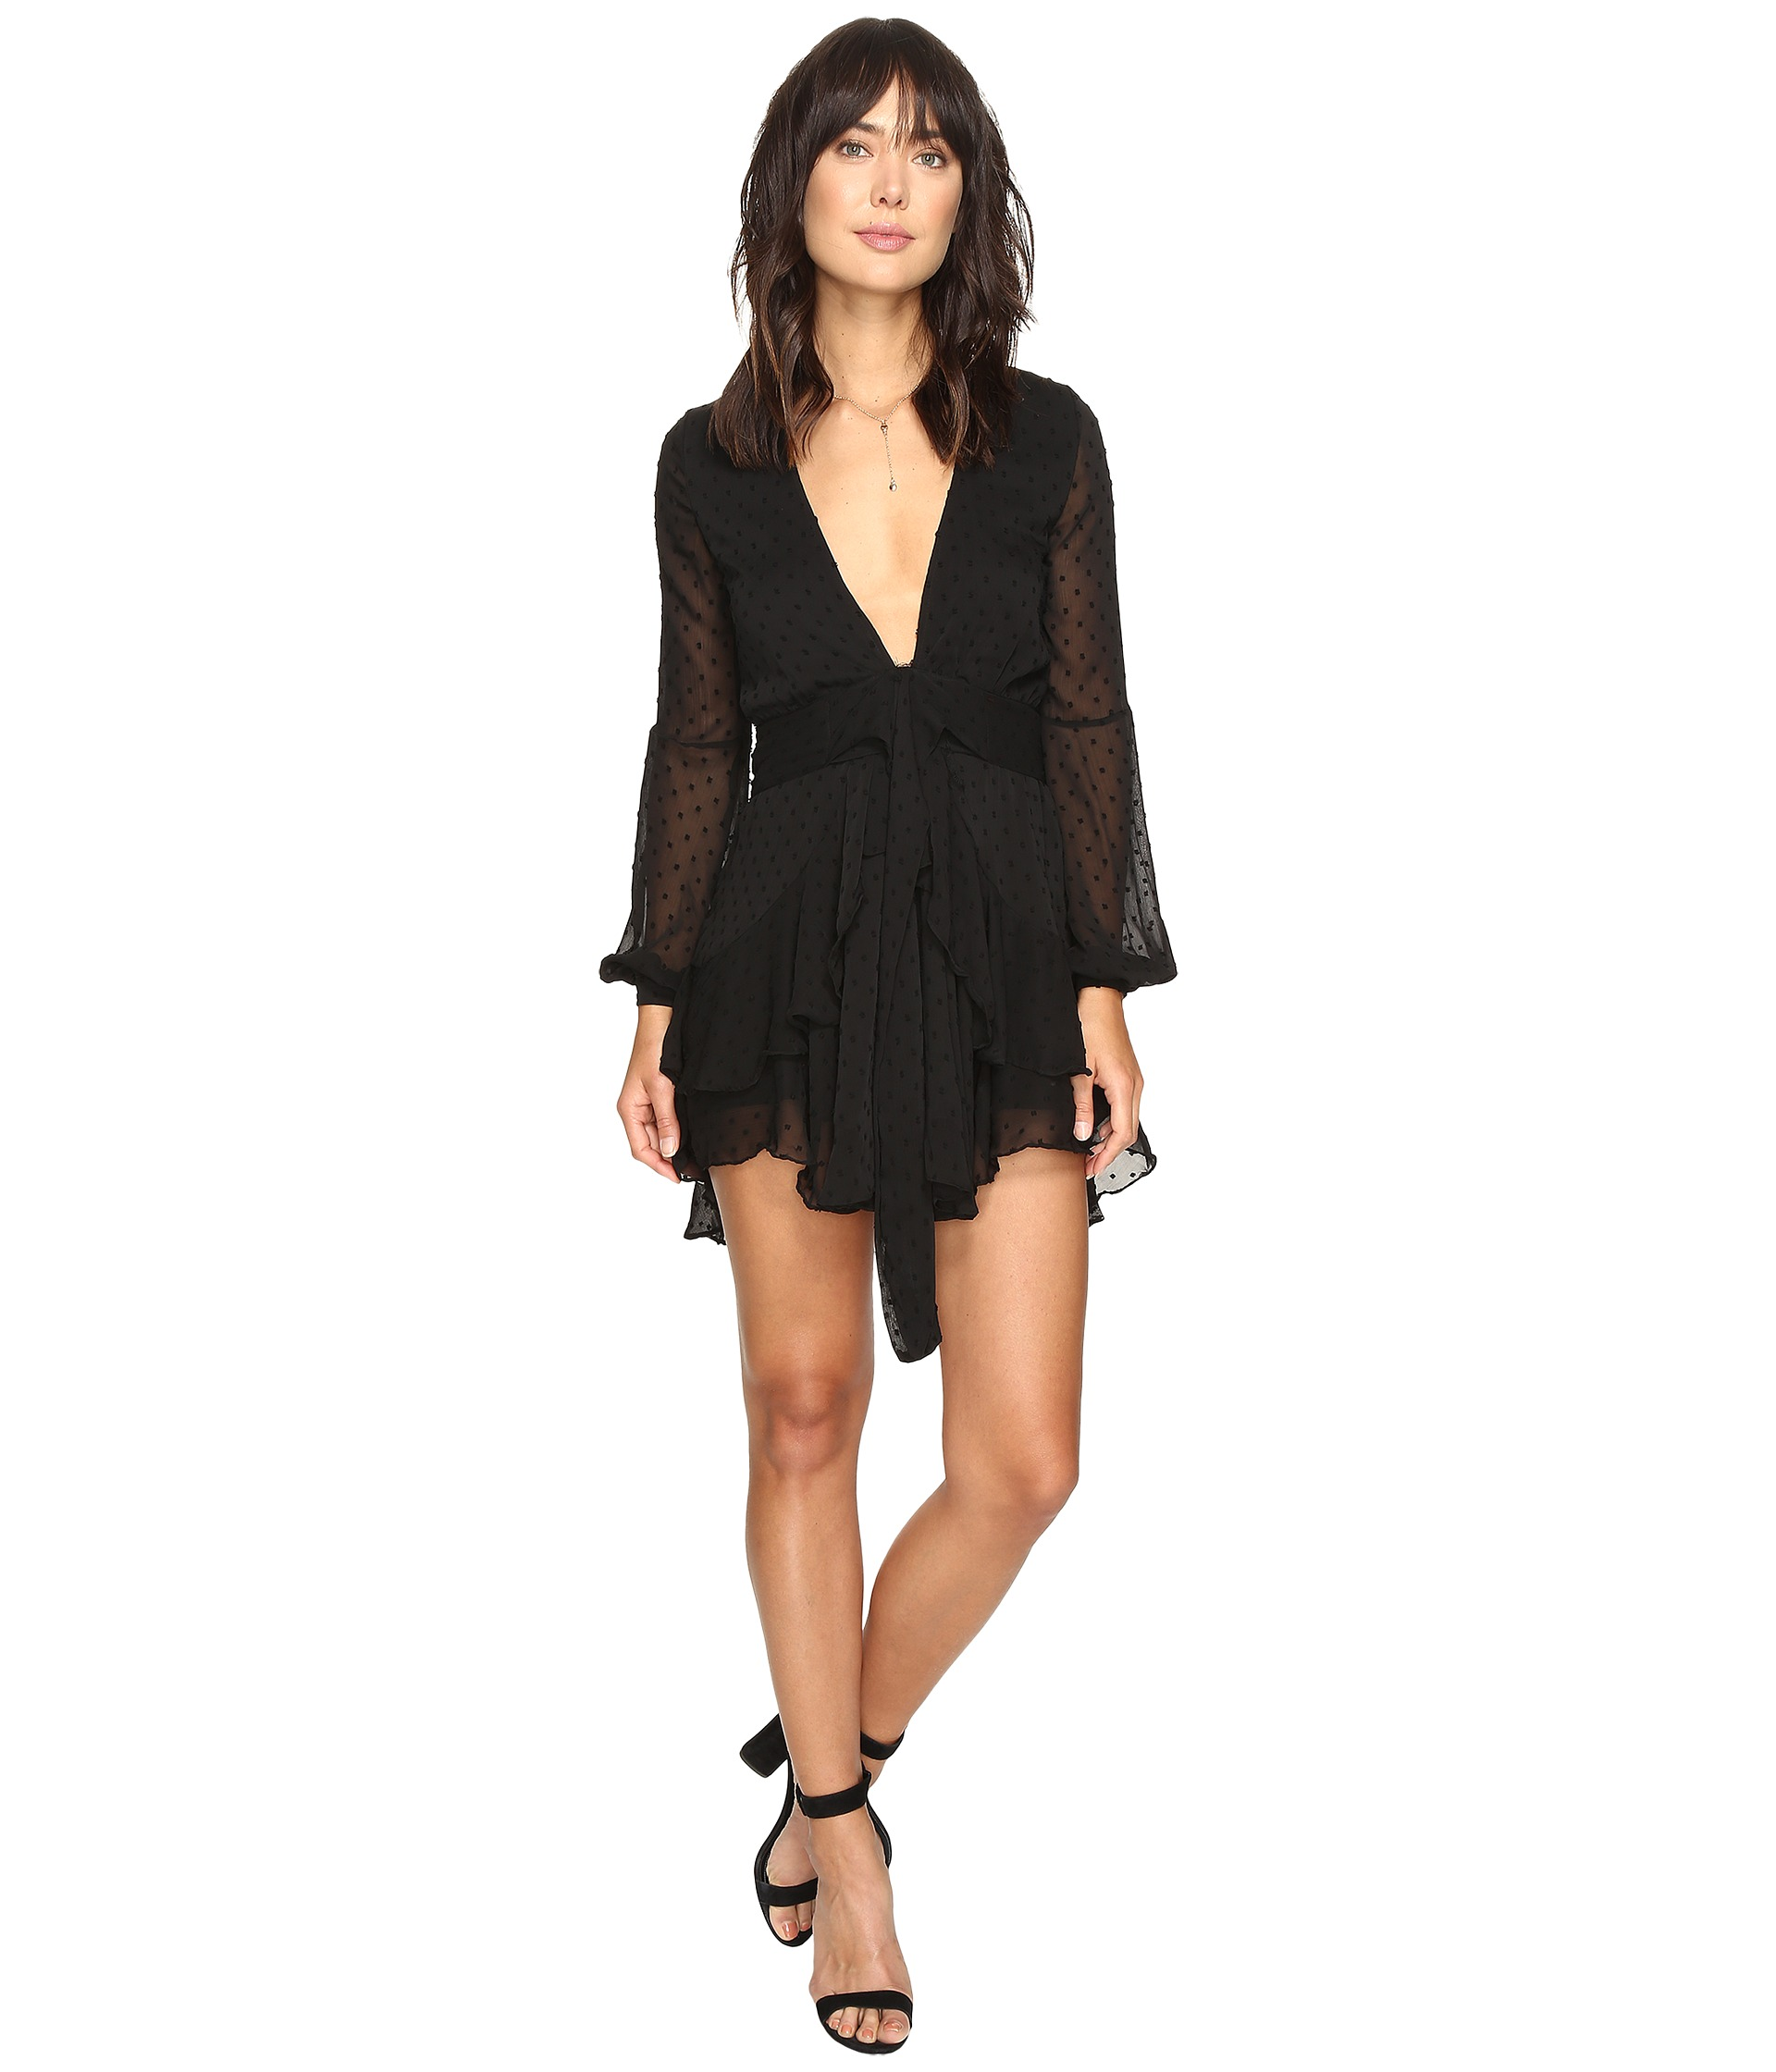 Long Sleeve Mini Dress - Shipped Free at Zappos